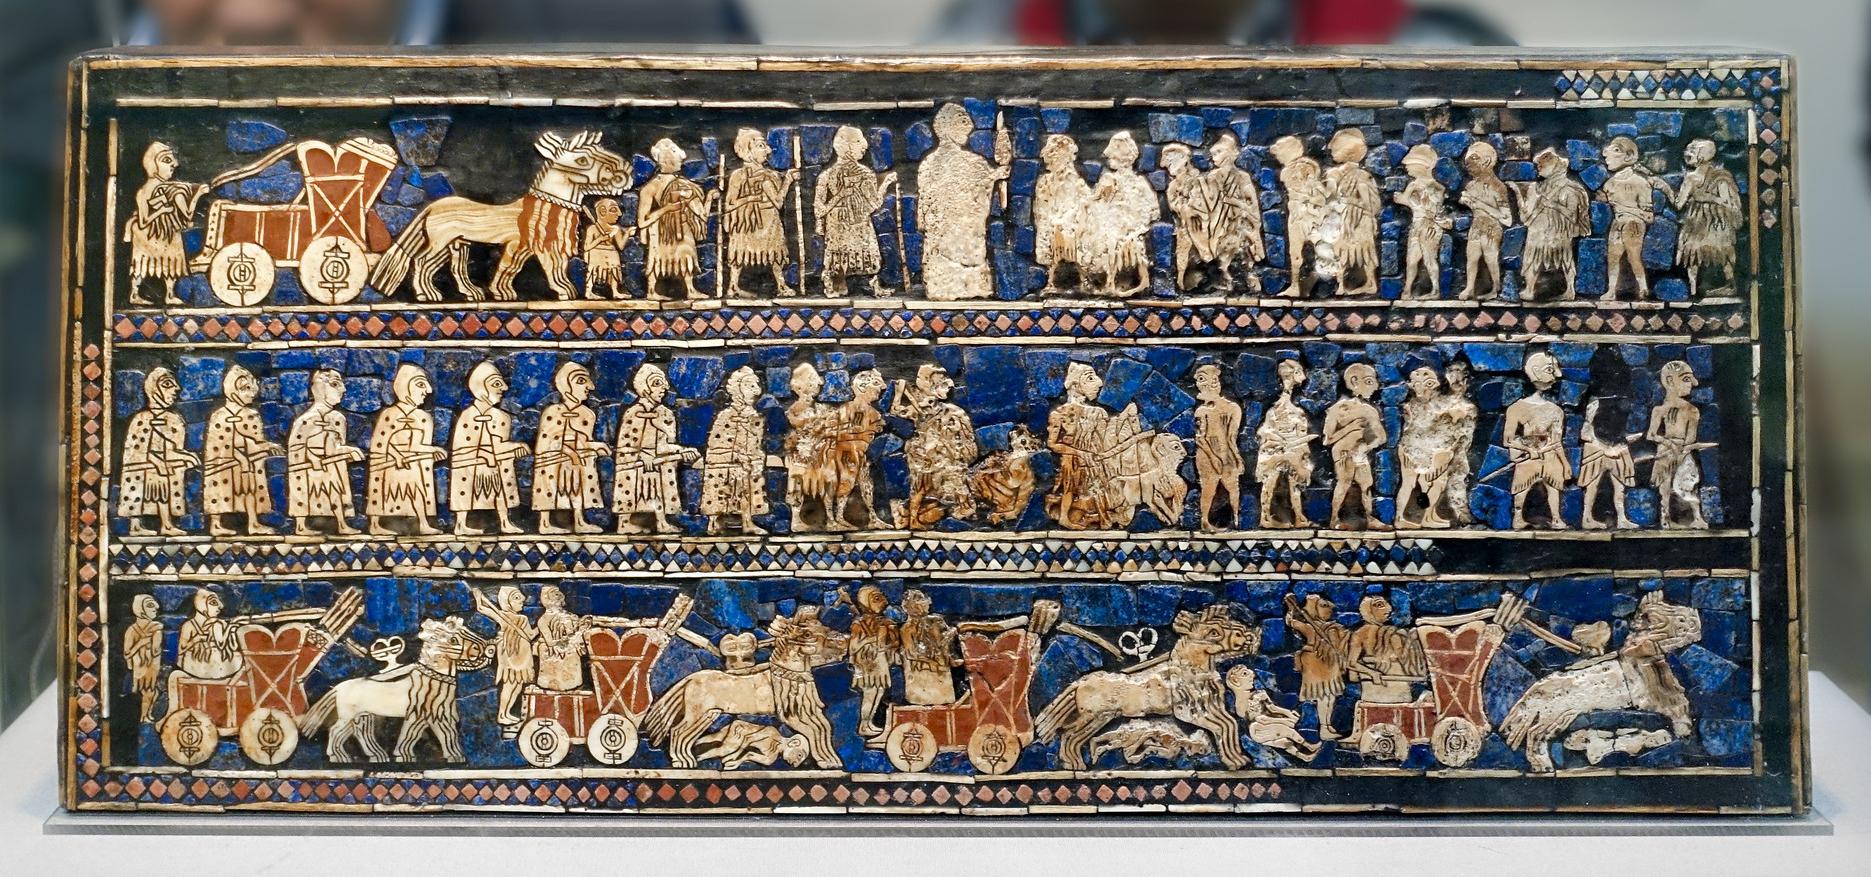 War (detail), The Standard of Ur, 2600-2400 B.C.E., shell, red limestone, lapis lazuli, and bitumen (original wood no longer exists), 21.59 x 49.53 x 12 cm (British Museum; photo: Steven Zucker, CC BY-NC-SA 2.0)